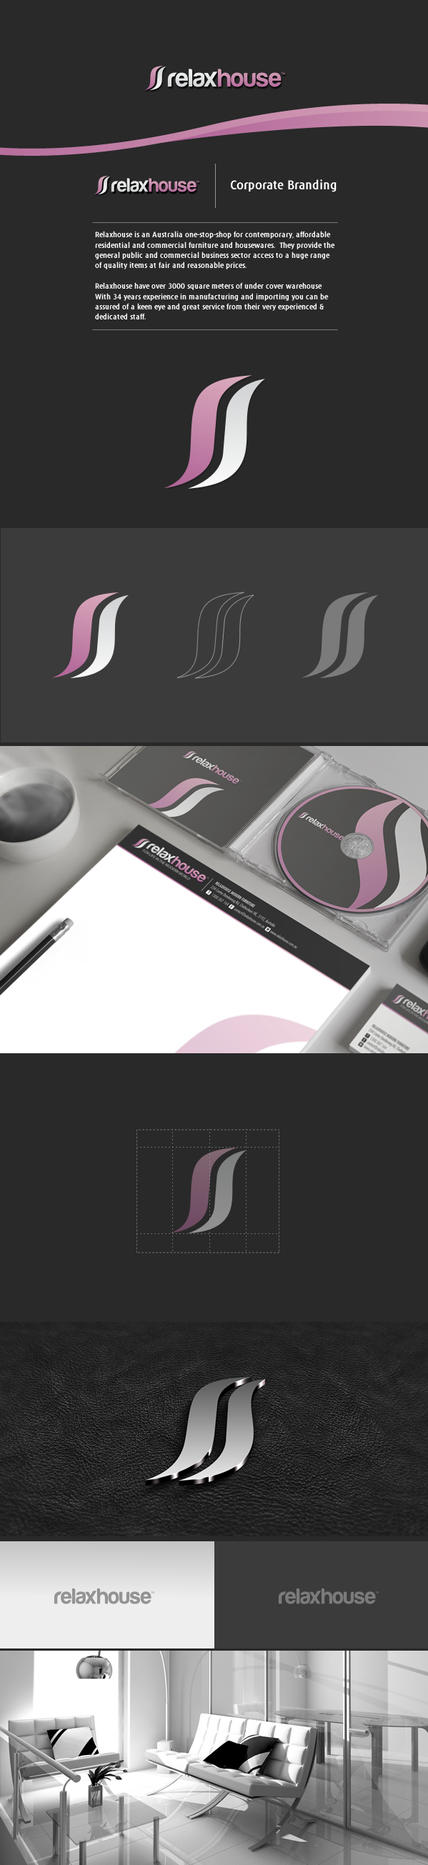 Relaxhouse Corporate identity // Branding by Lemongraphic